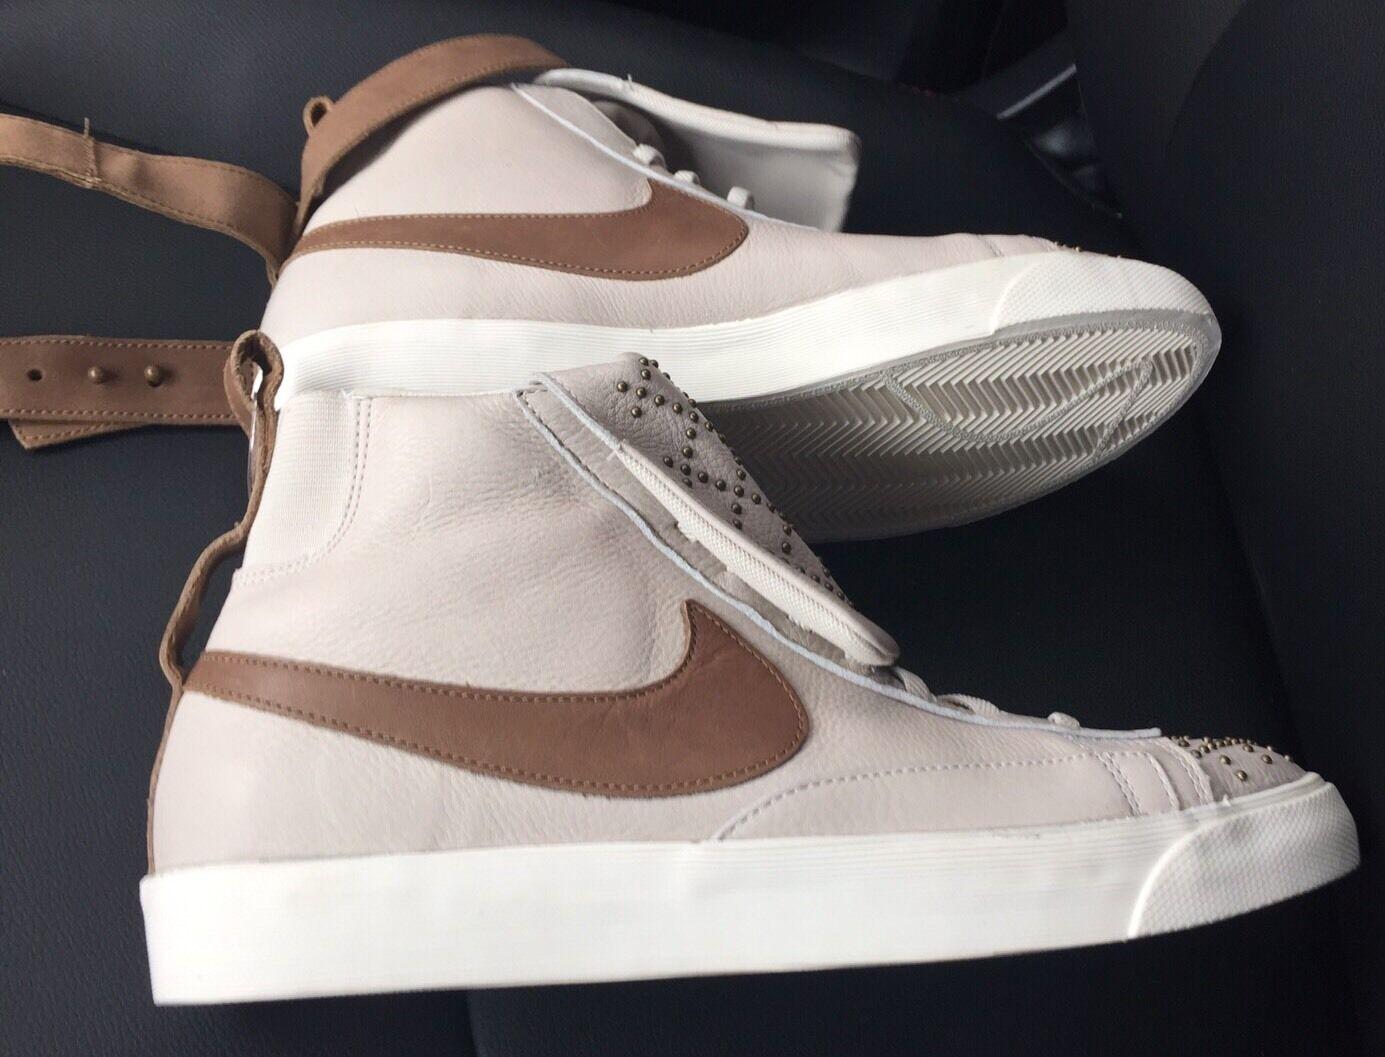 NIKE Blazer Mid PRM Twist Studs Tan Street Shoes Sneakers 599387-002